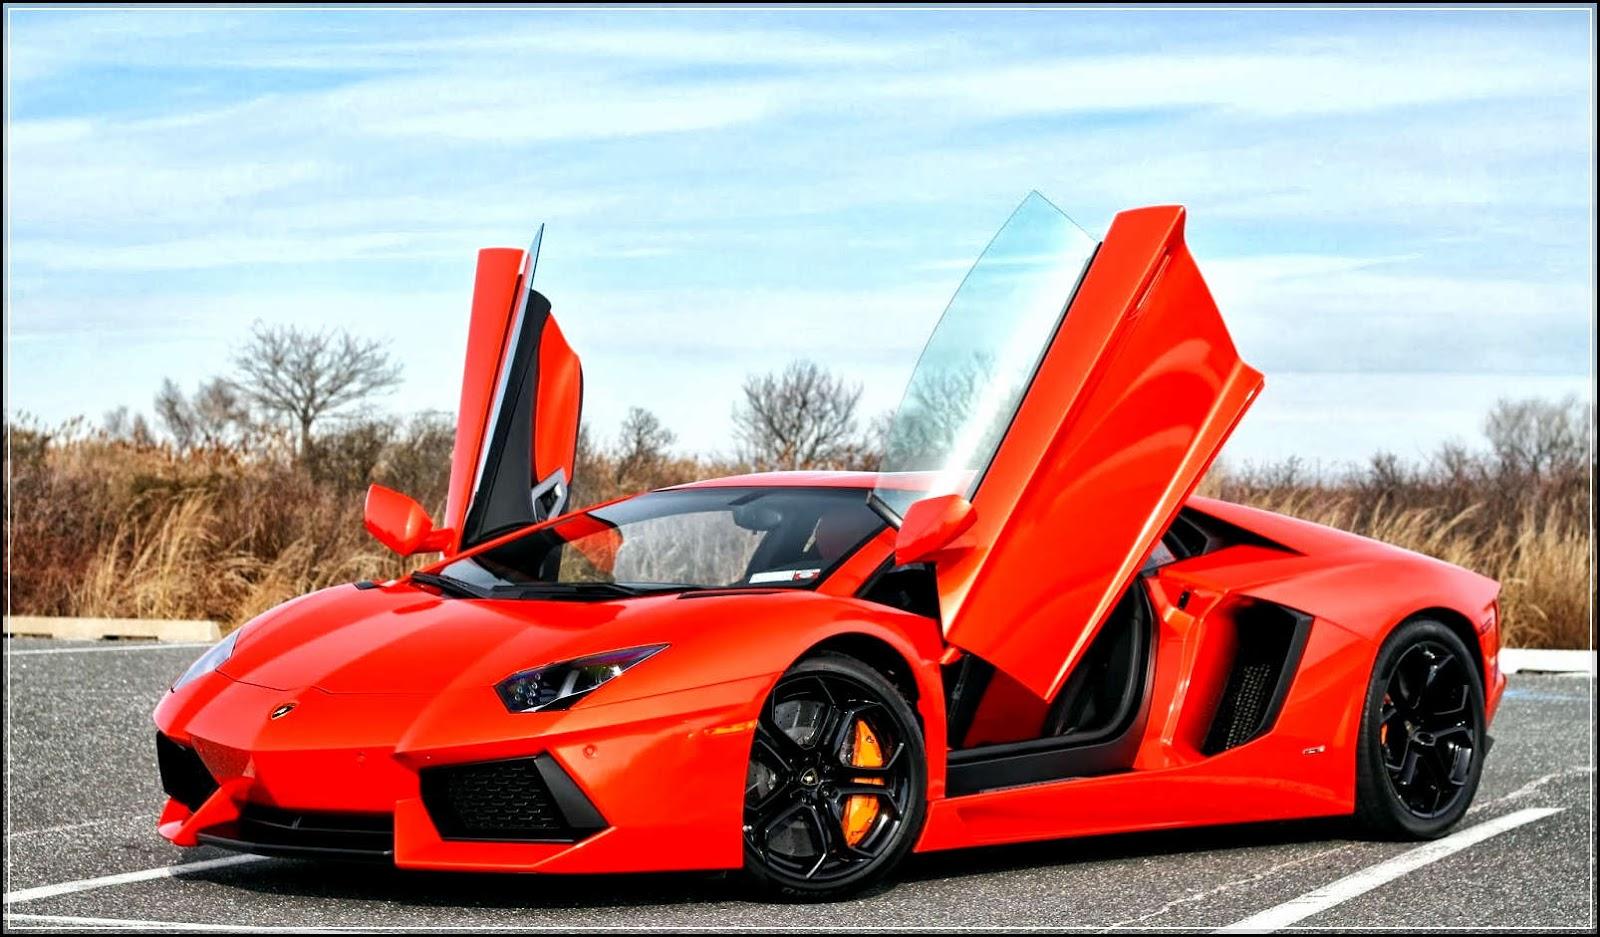 Foto Modifikasi Mobil Lamborghini